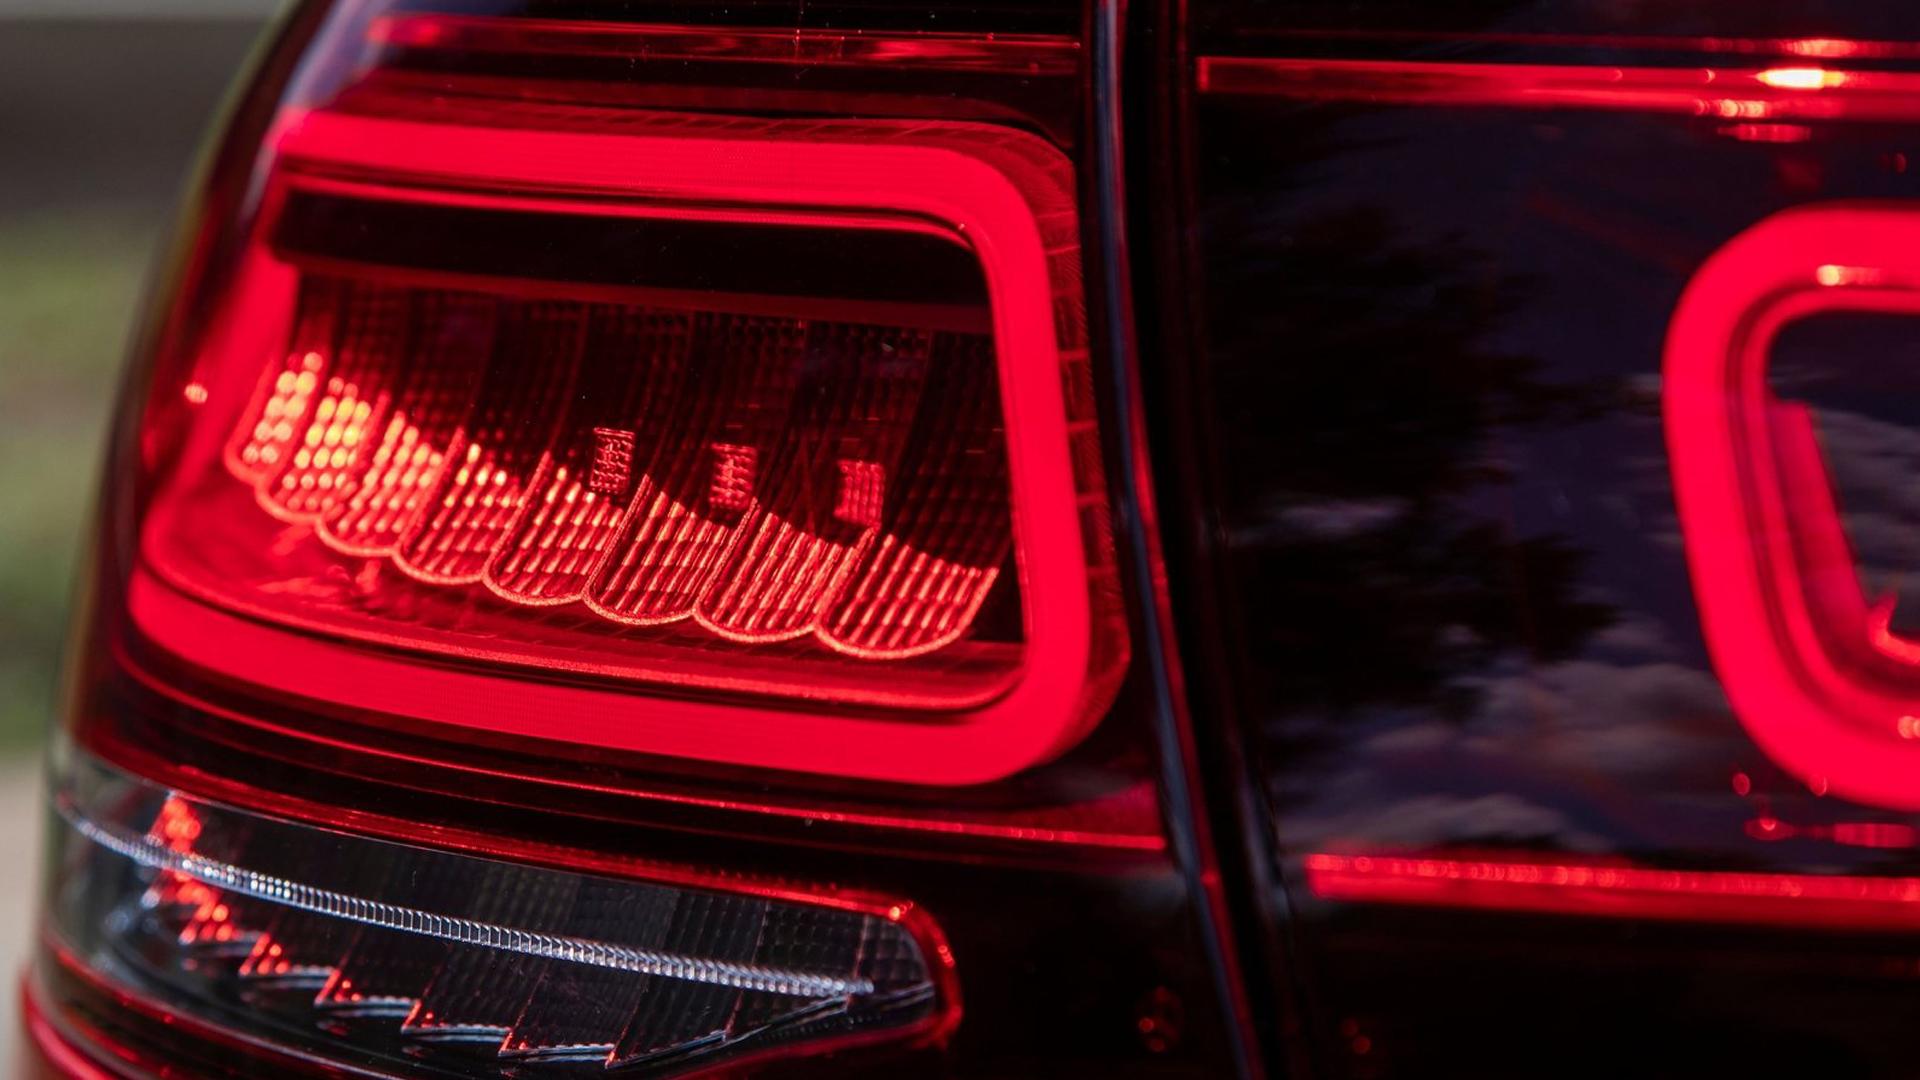 wp_MBleuchte_0008_Mercedes-Benz-GLC_Coupe-2020-1600-9b